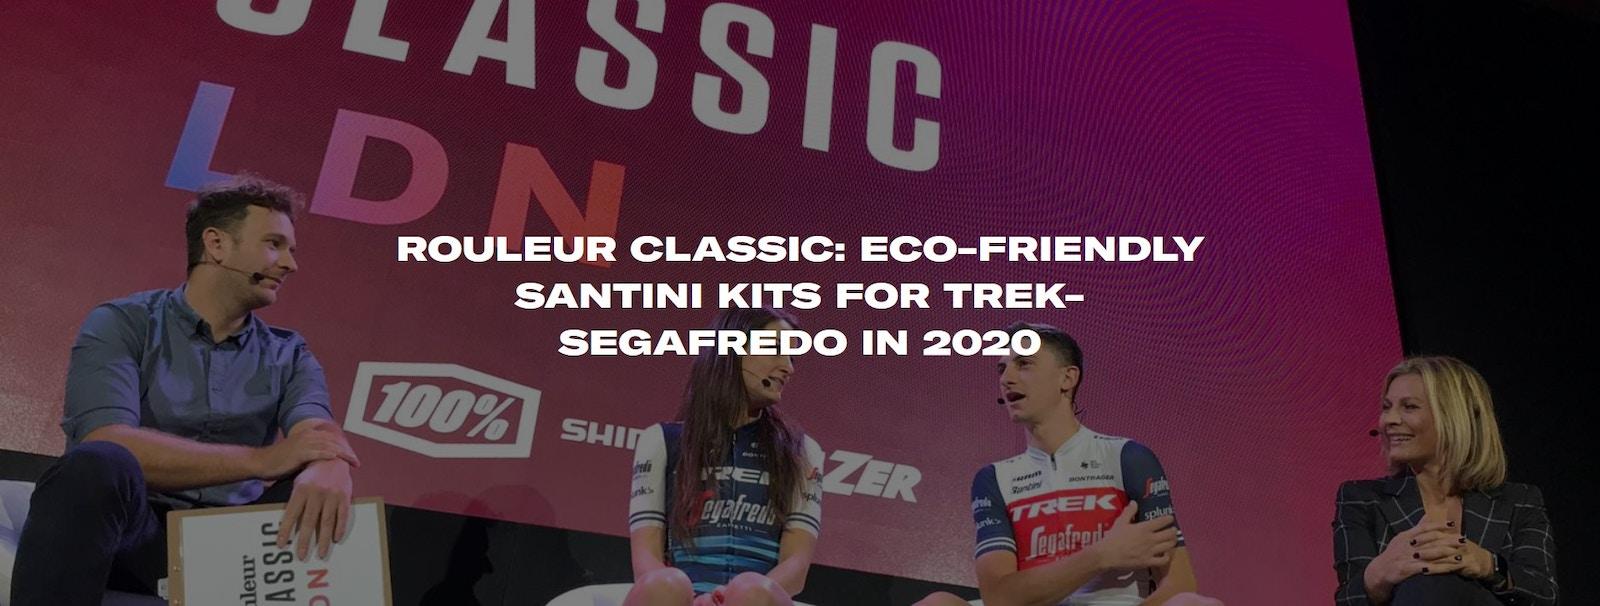 Santini - Roleur Classic: Exo-friendly Santini Kits for Trek-Segafredo in 2020